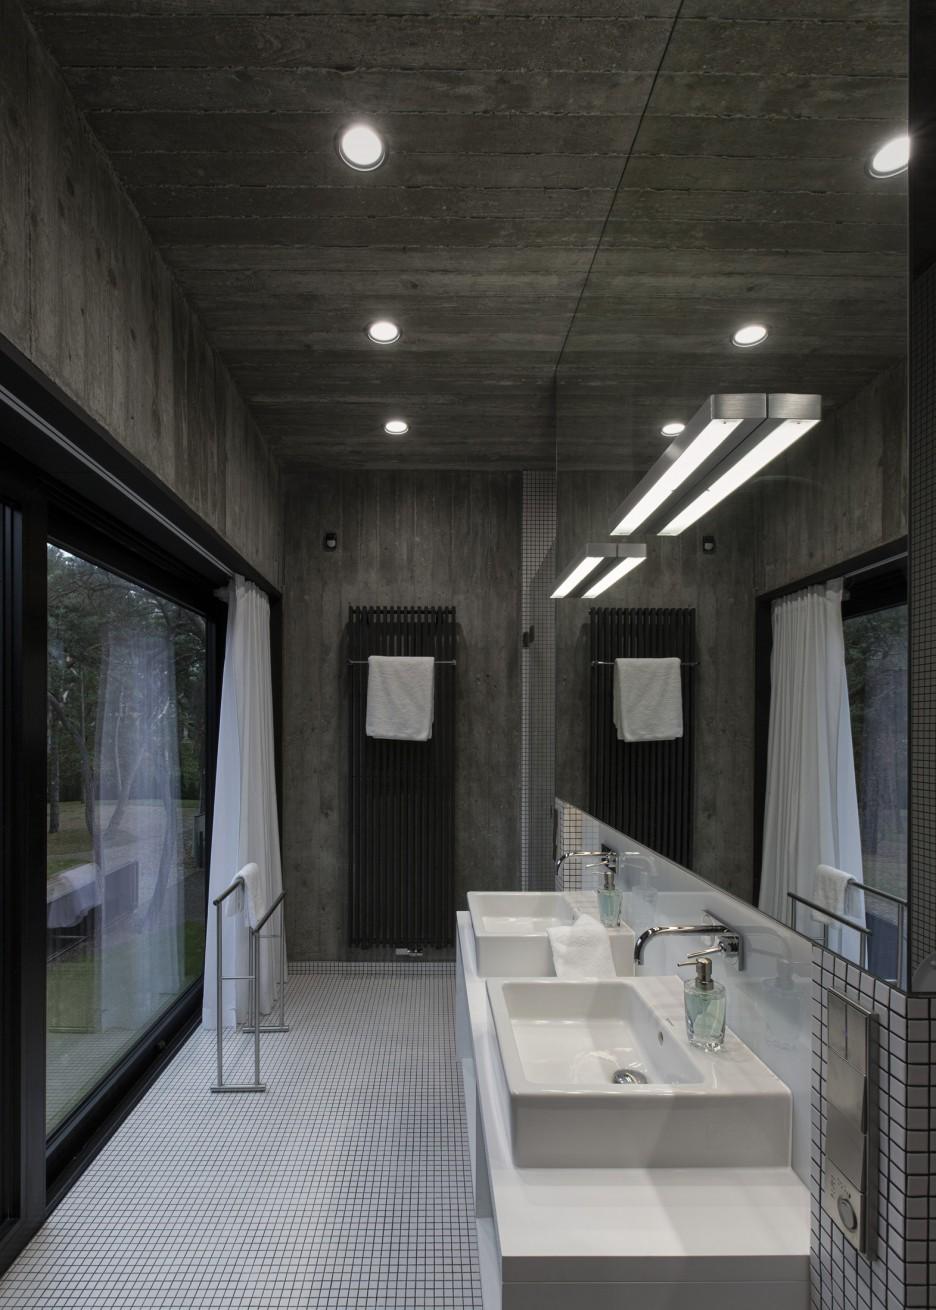 Interior design ideas architecture blog modern design for Tight bathroom design